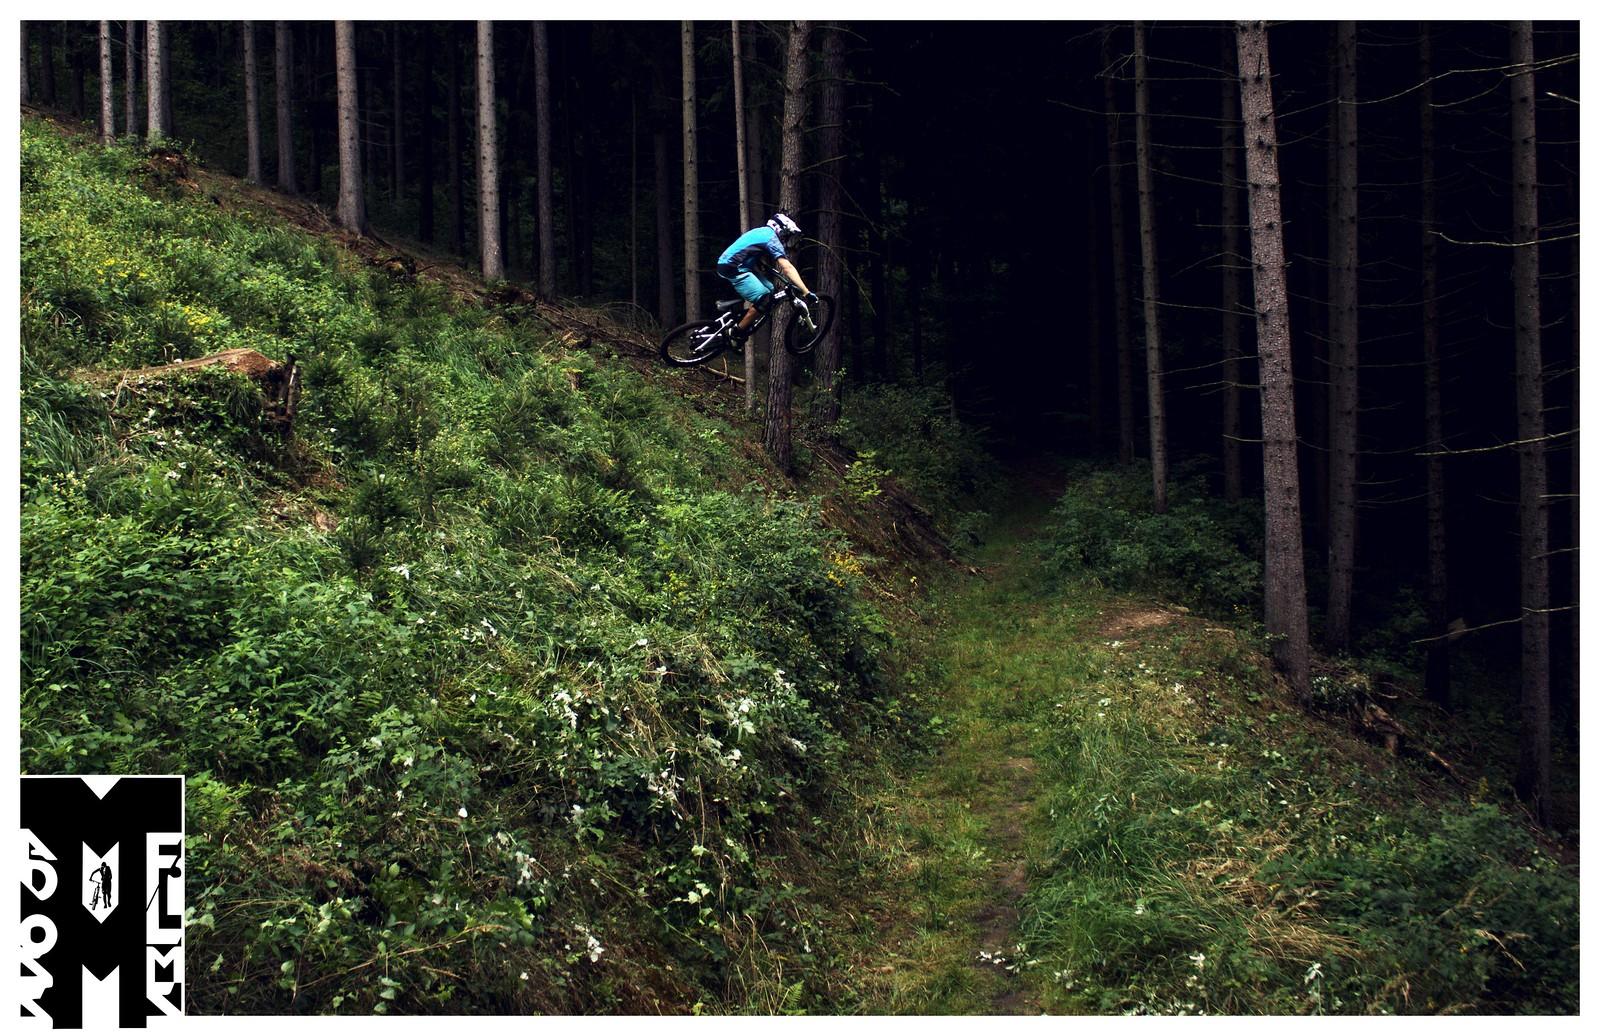 Pavel Schwarz - Roadgap - Mad Moss - Mountain Biking Pictures - Vital MTB